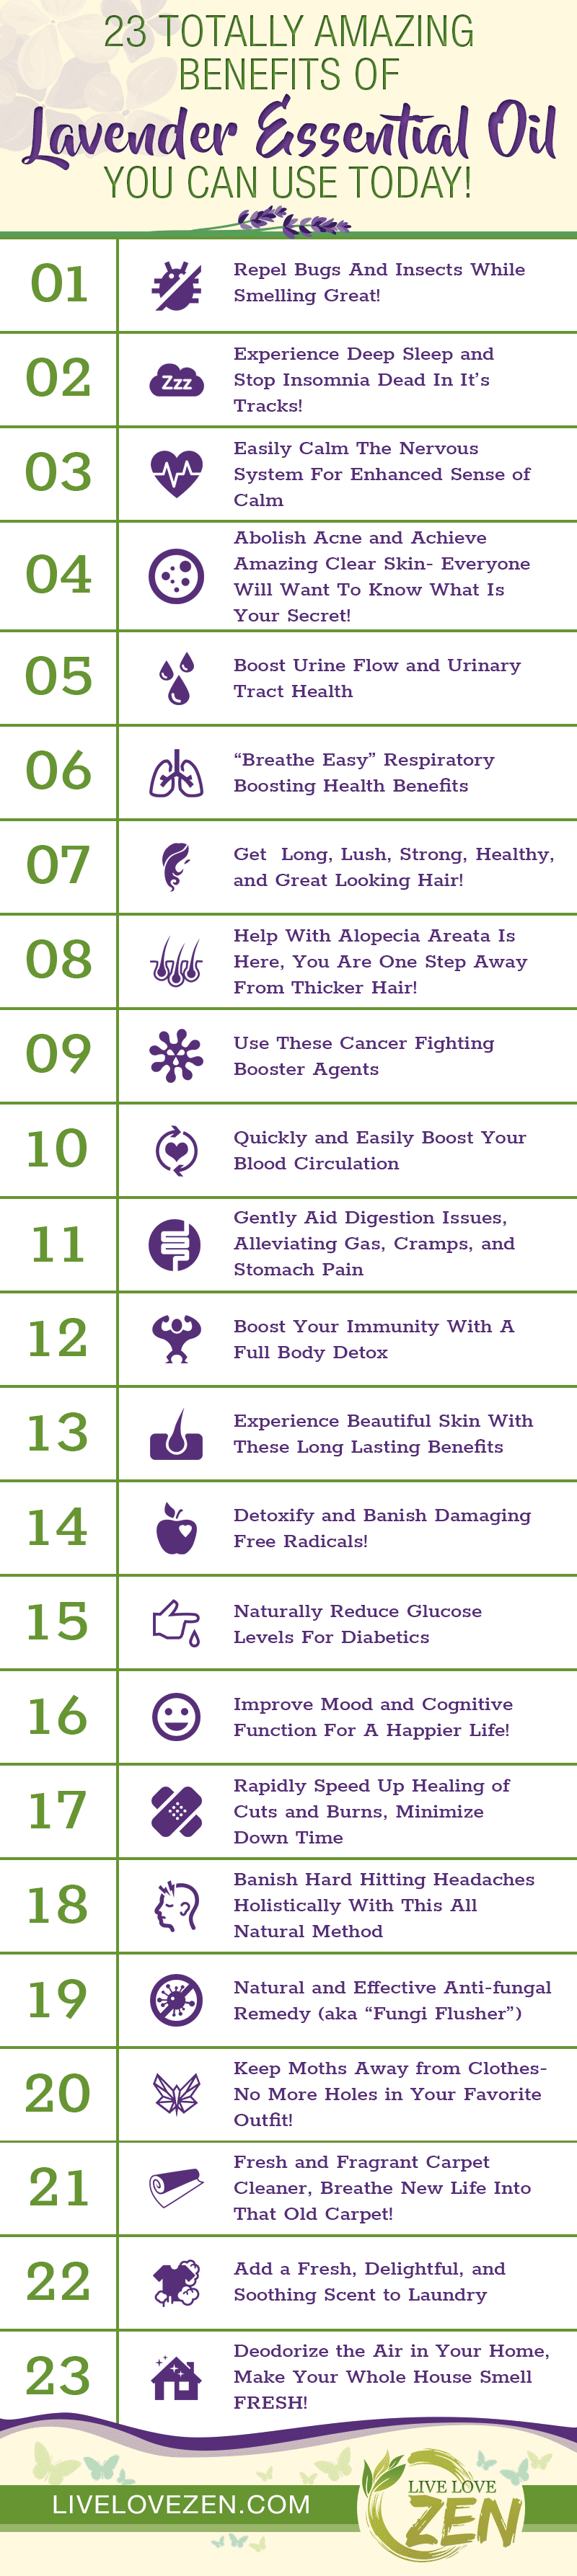 lavender essential oil health benefits